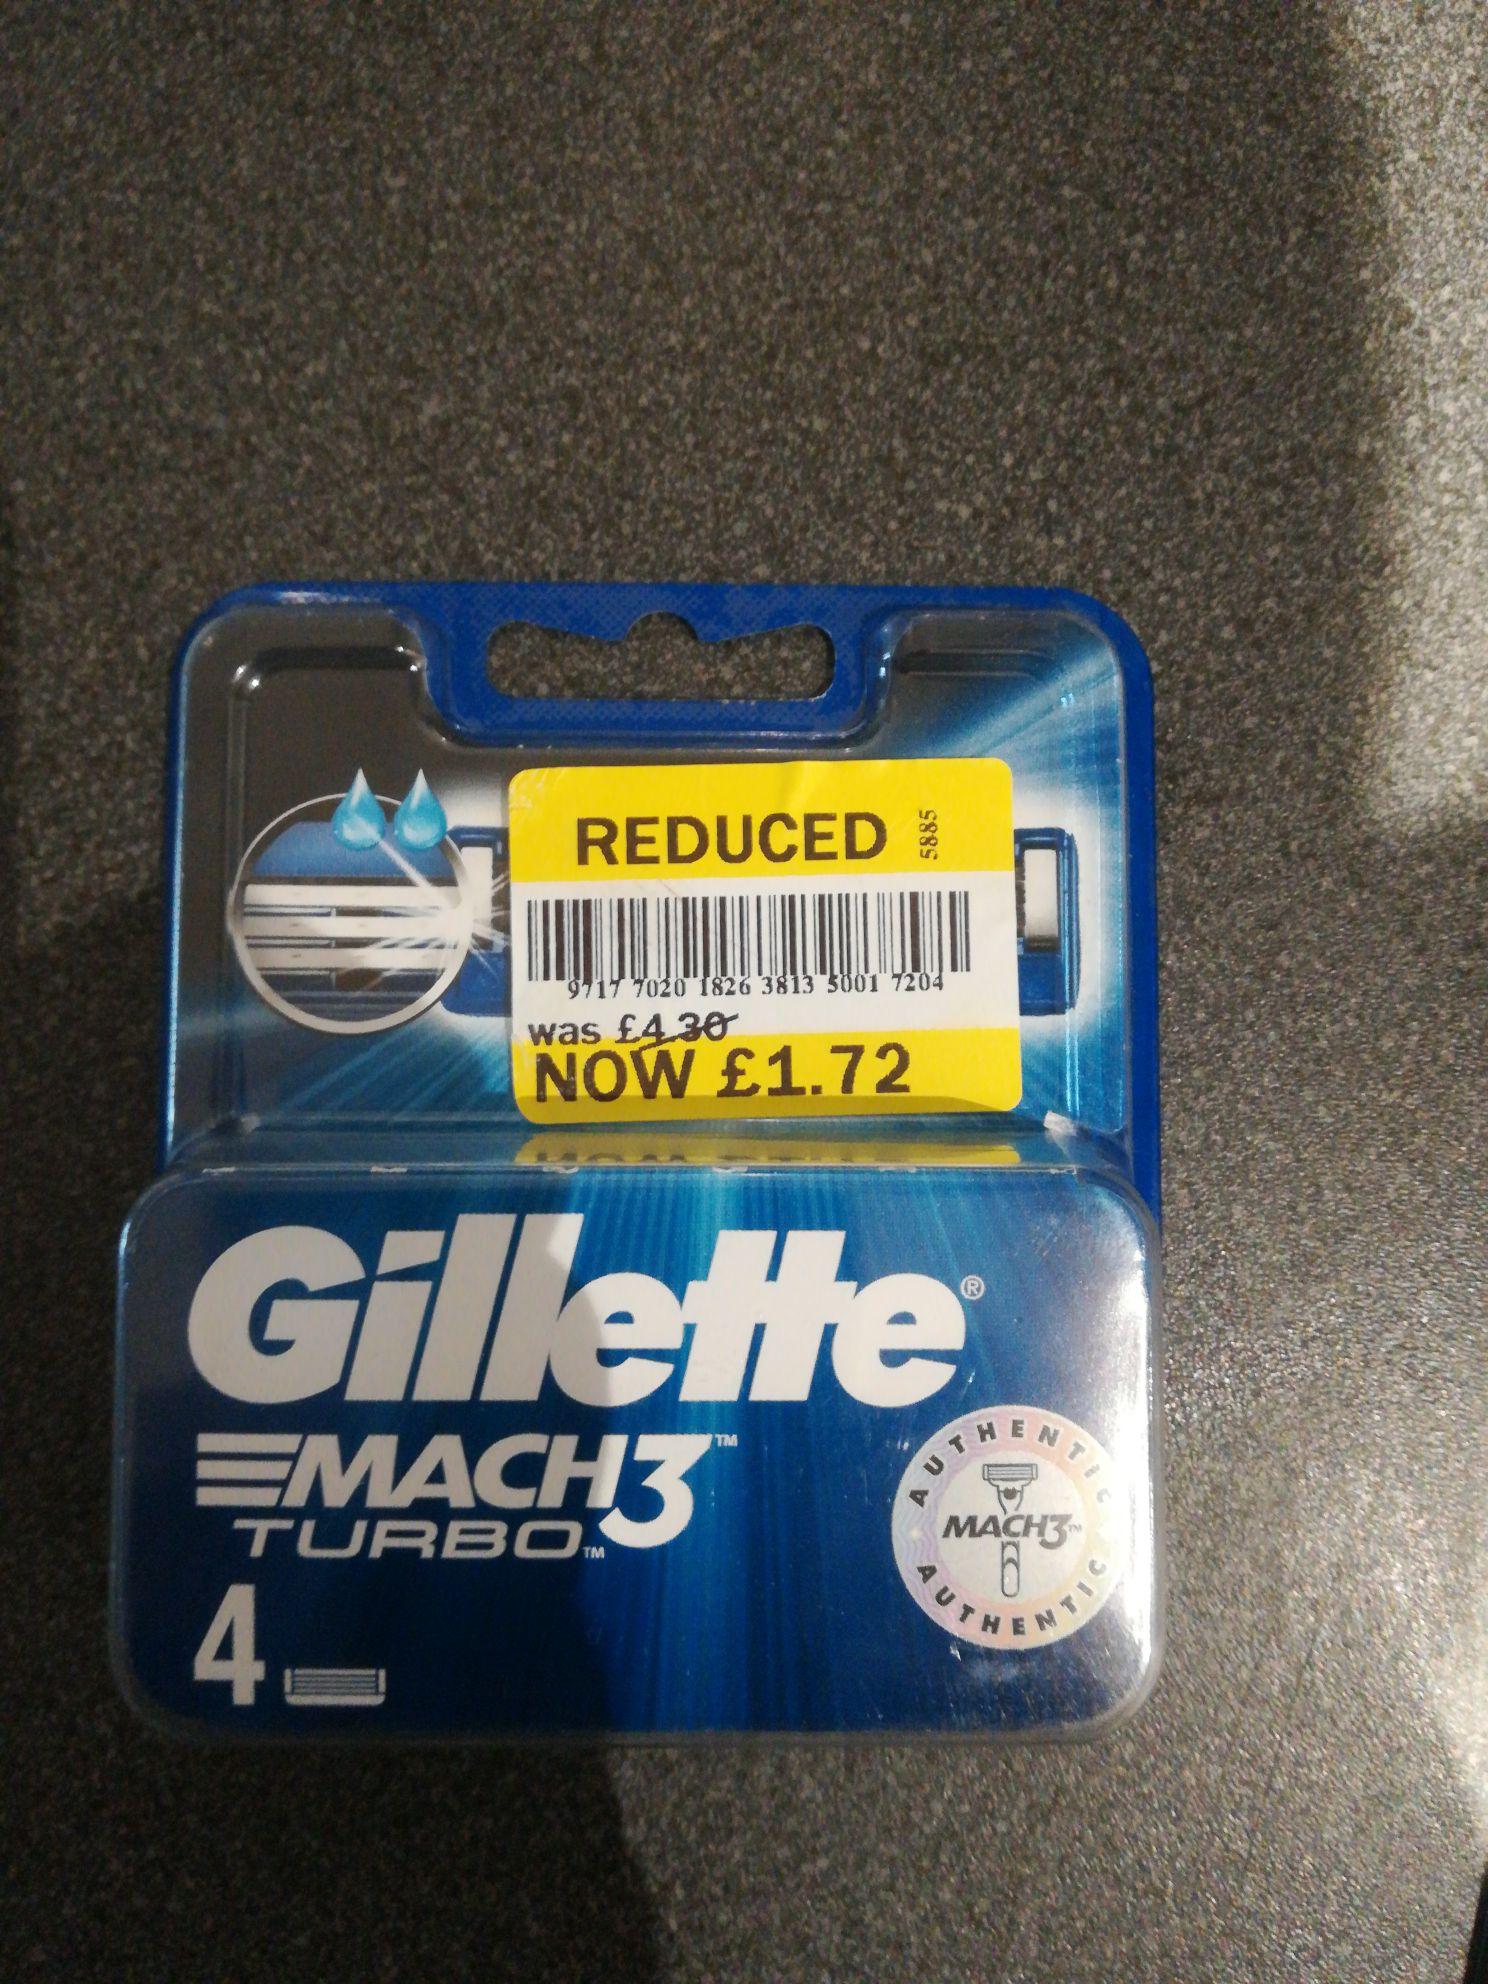 4 X Gillette Mach 3 Turbo blades - £1.72 instore @ Tesco (Liverpool)